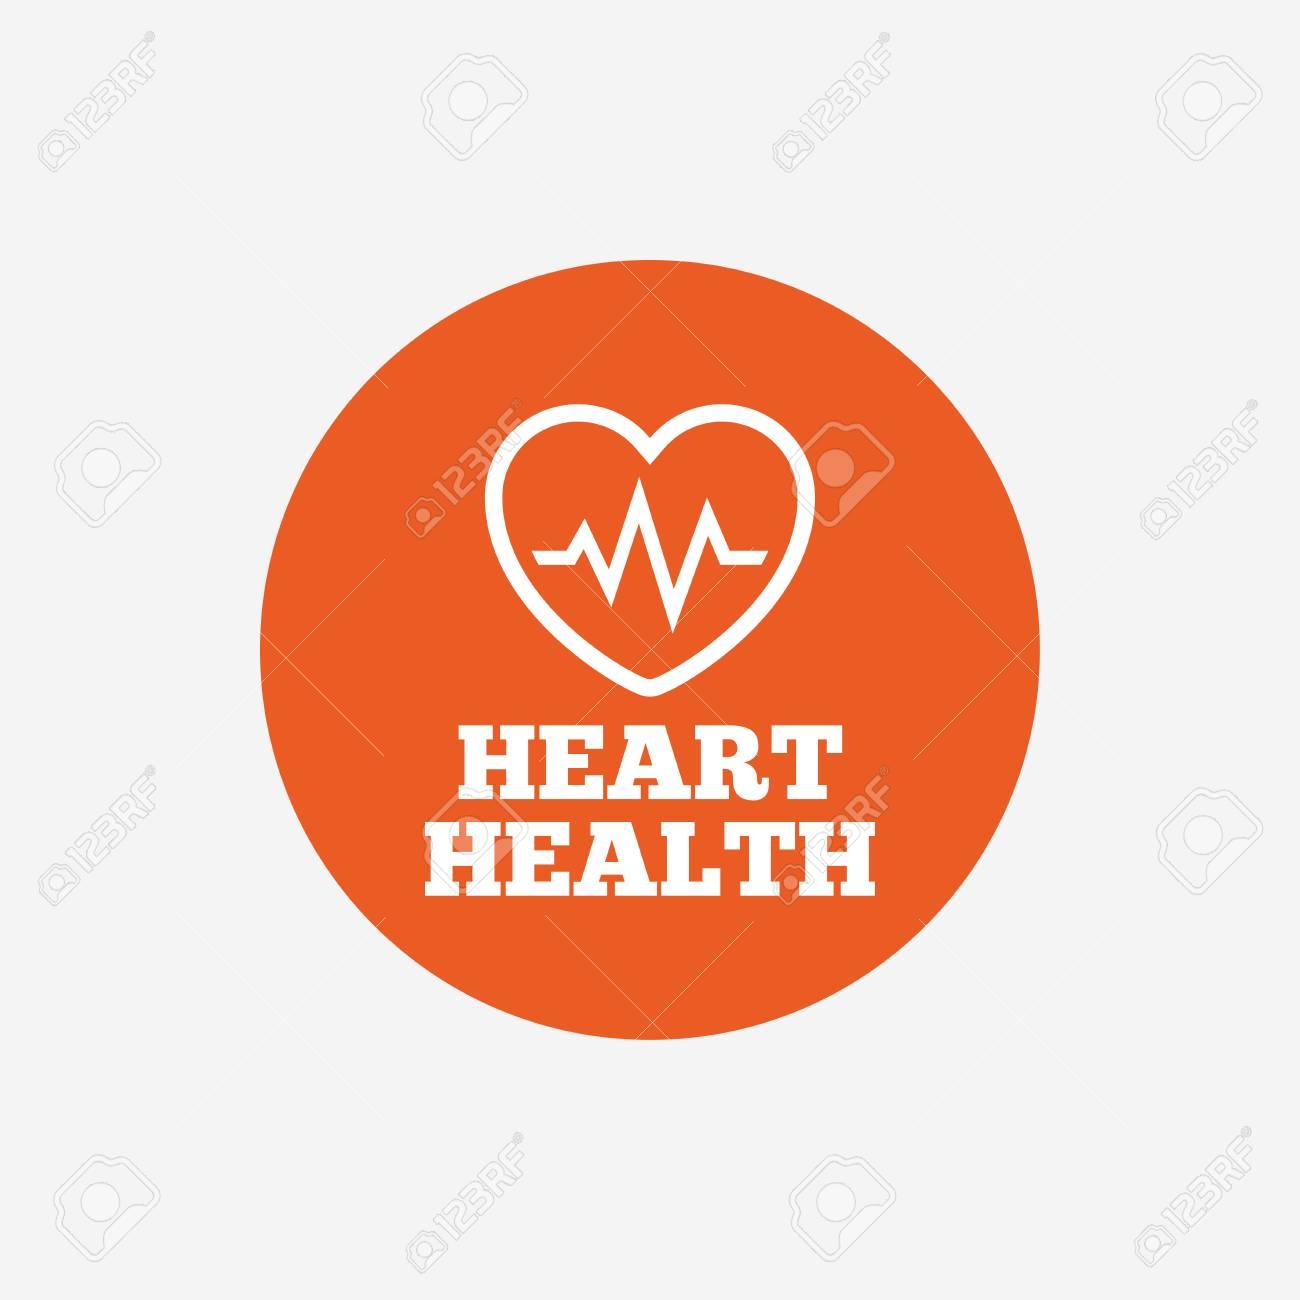 Heartbeat Sign Icon Heart Health Cardiogram Check Symbol Orange